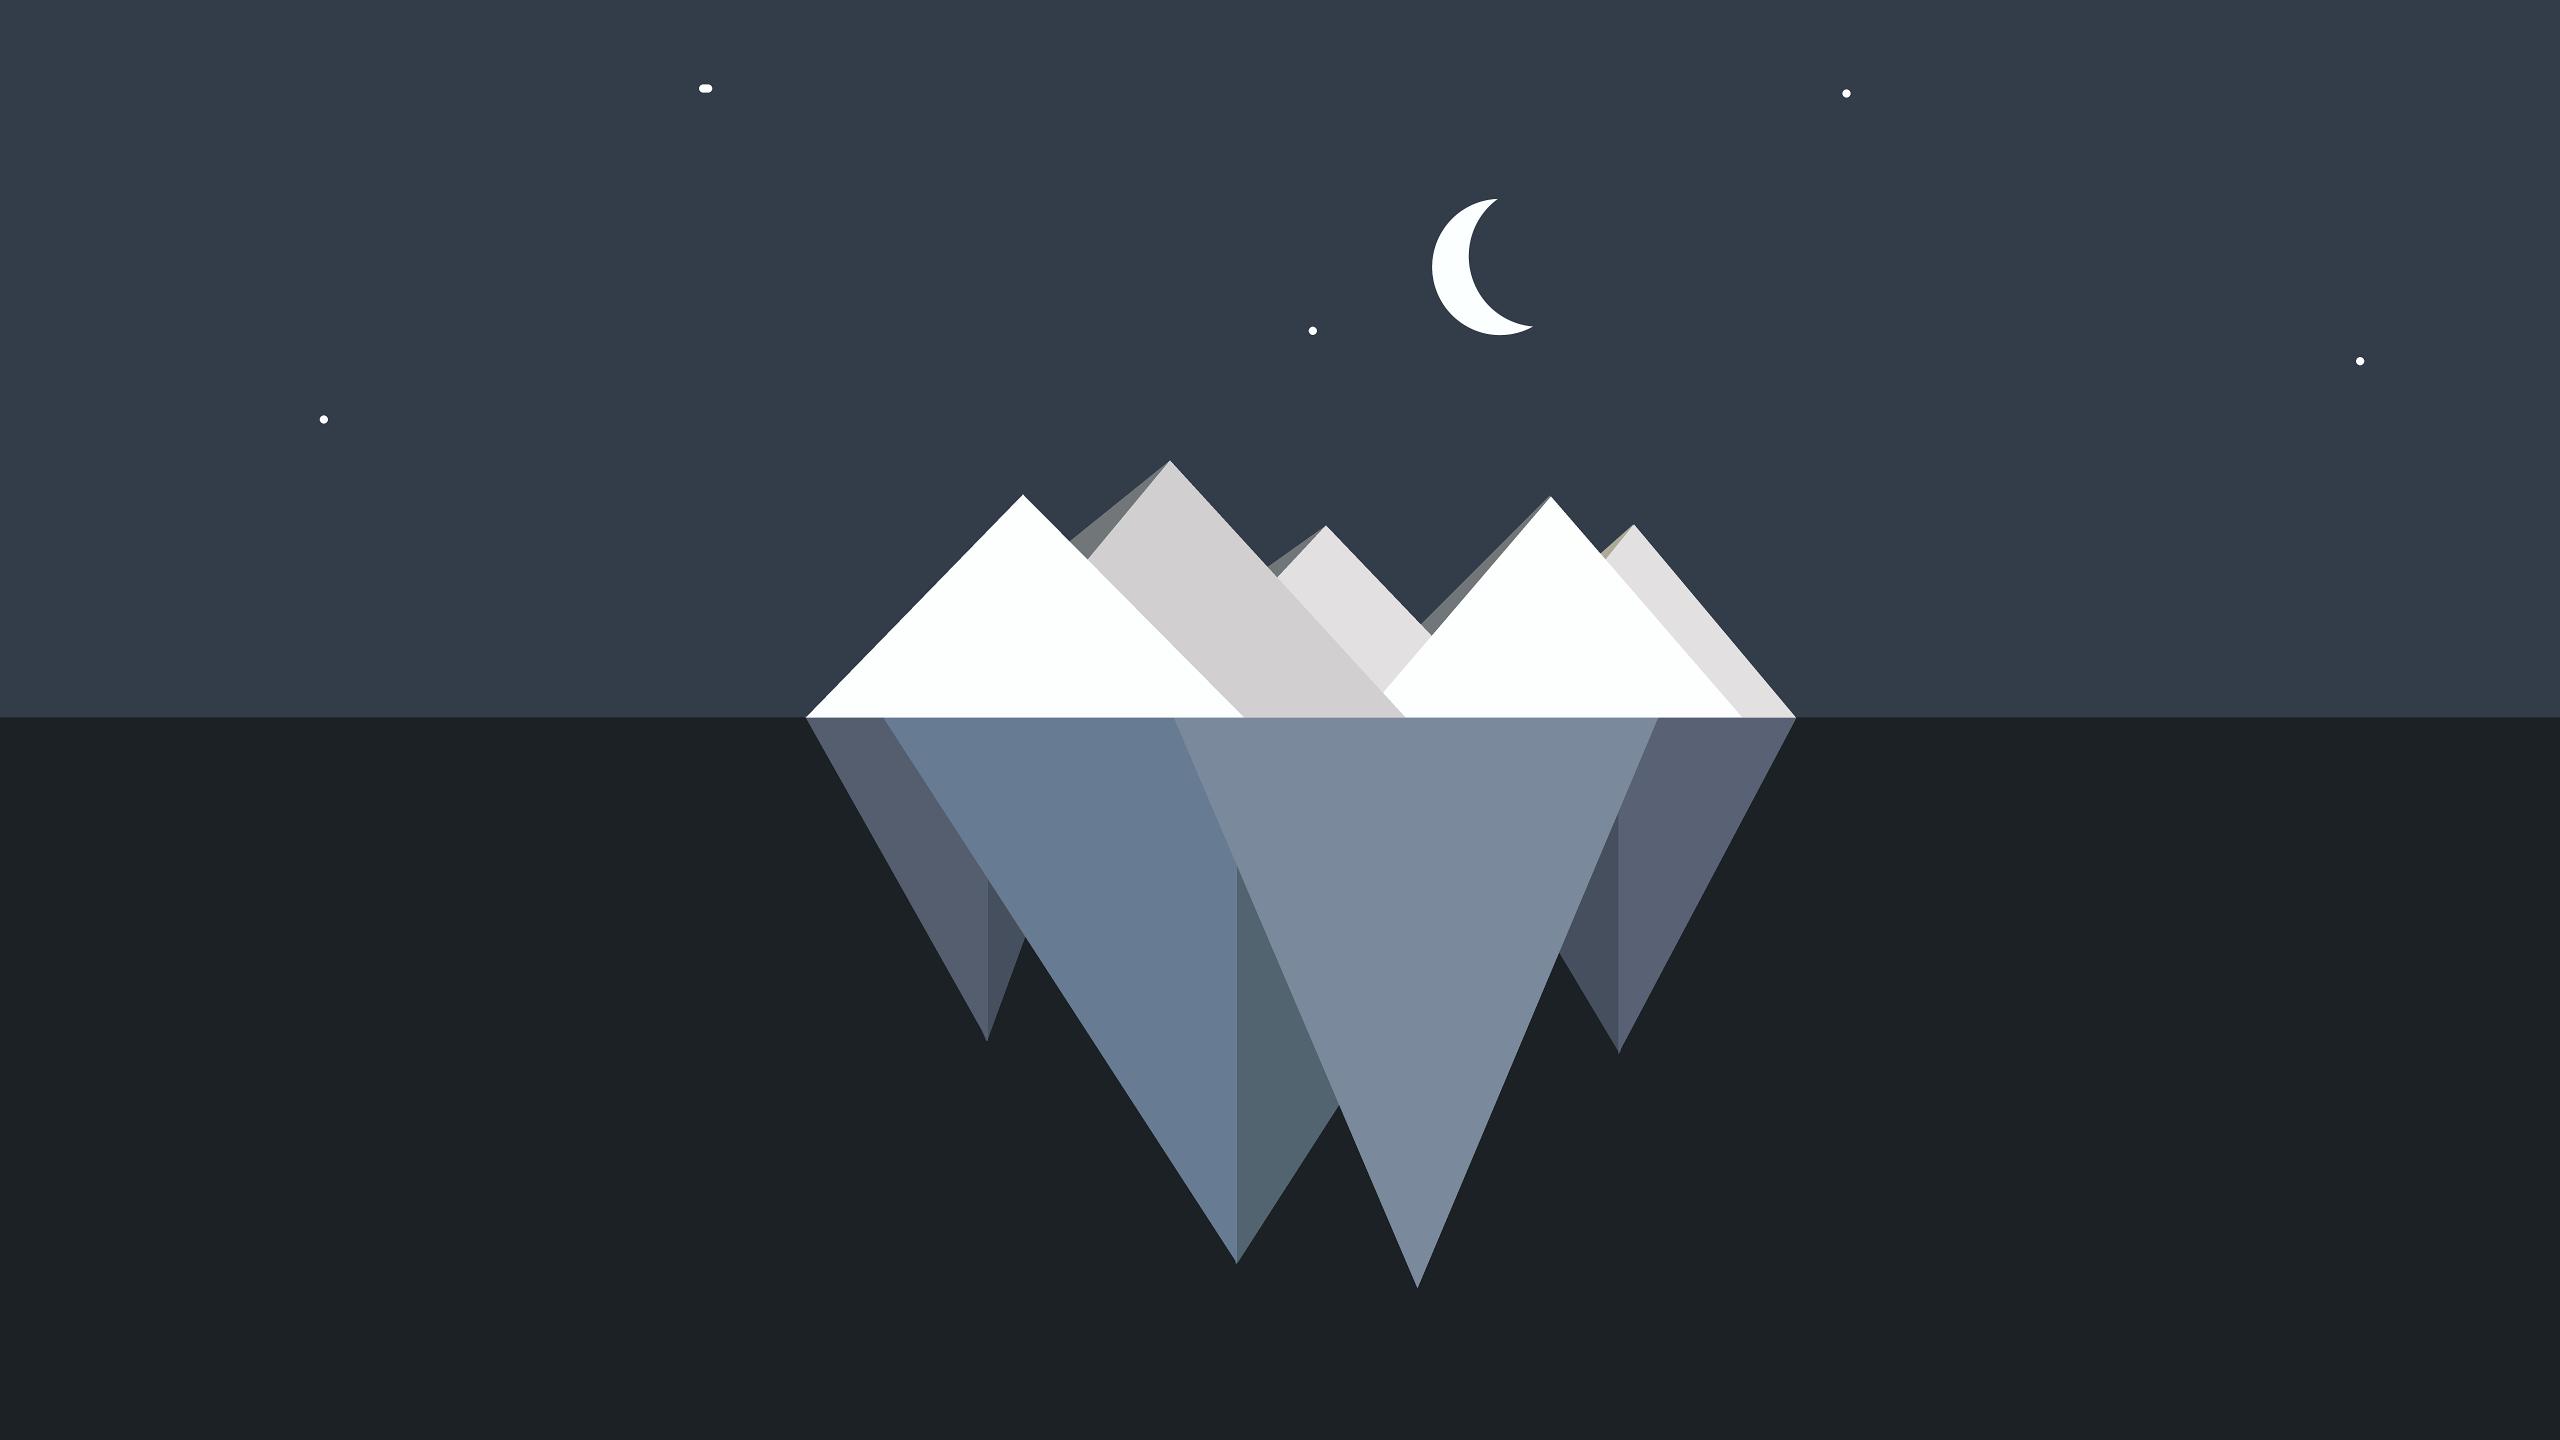 2560x1440 Iceberg Minimalist 1440P Resolution Wallpaper ...